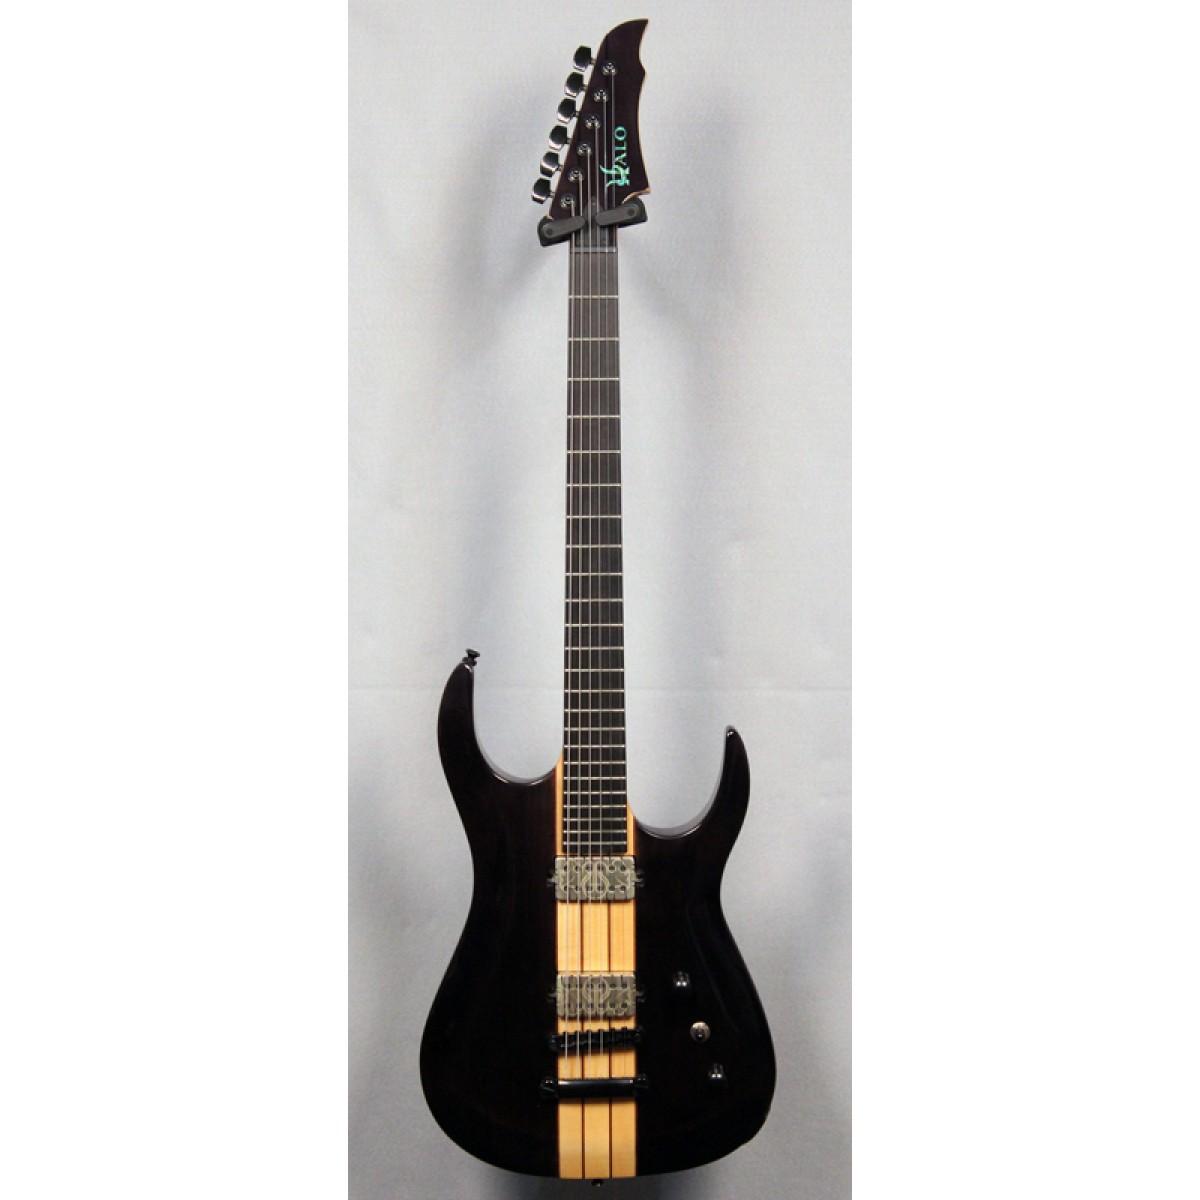 halo guitars merus 6 string 27 scale bkps tune o matic. Black Bedroom Furniture Sets. Home Design Ideas